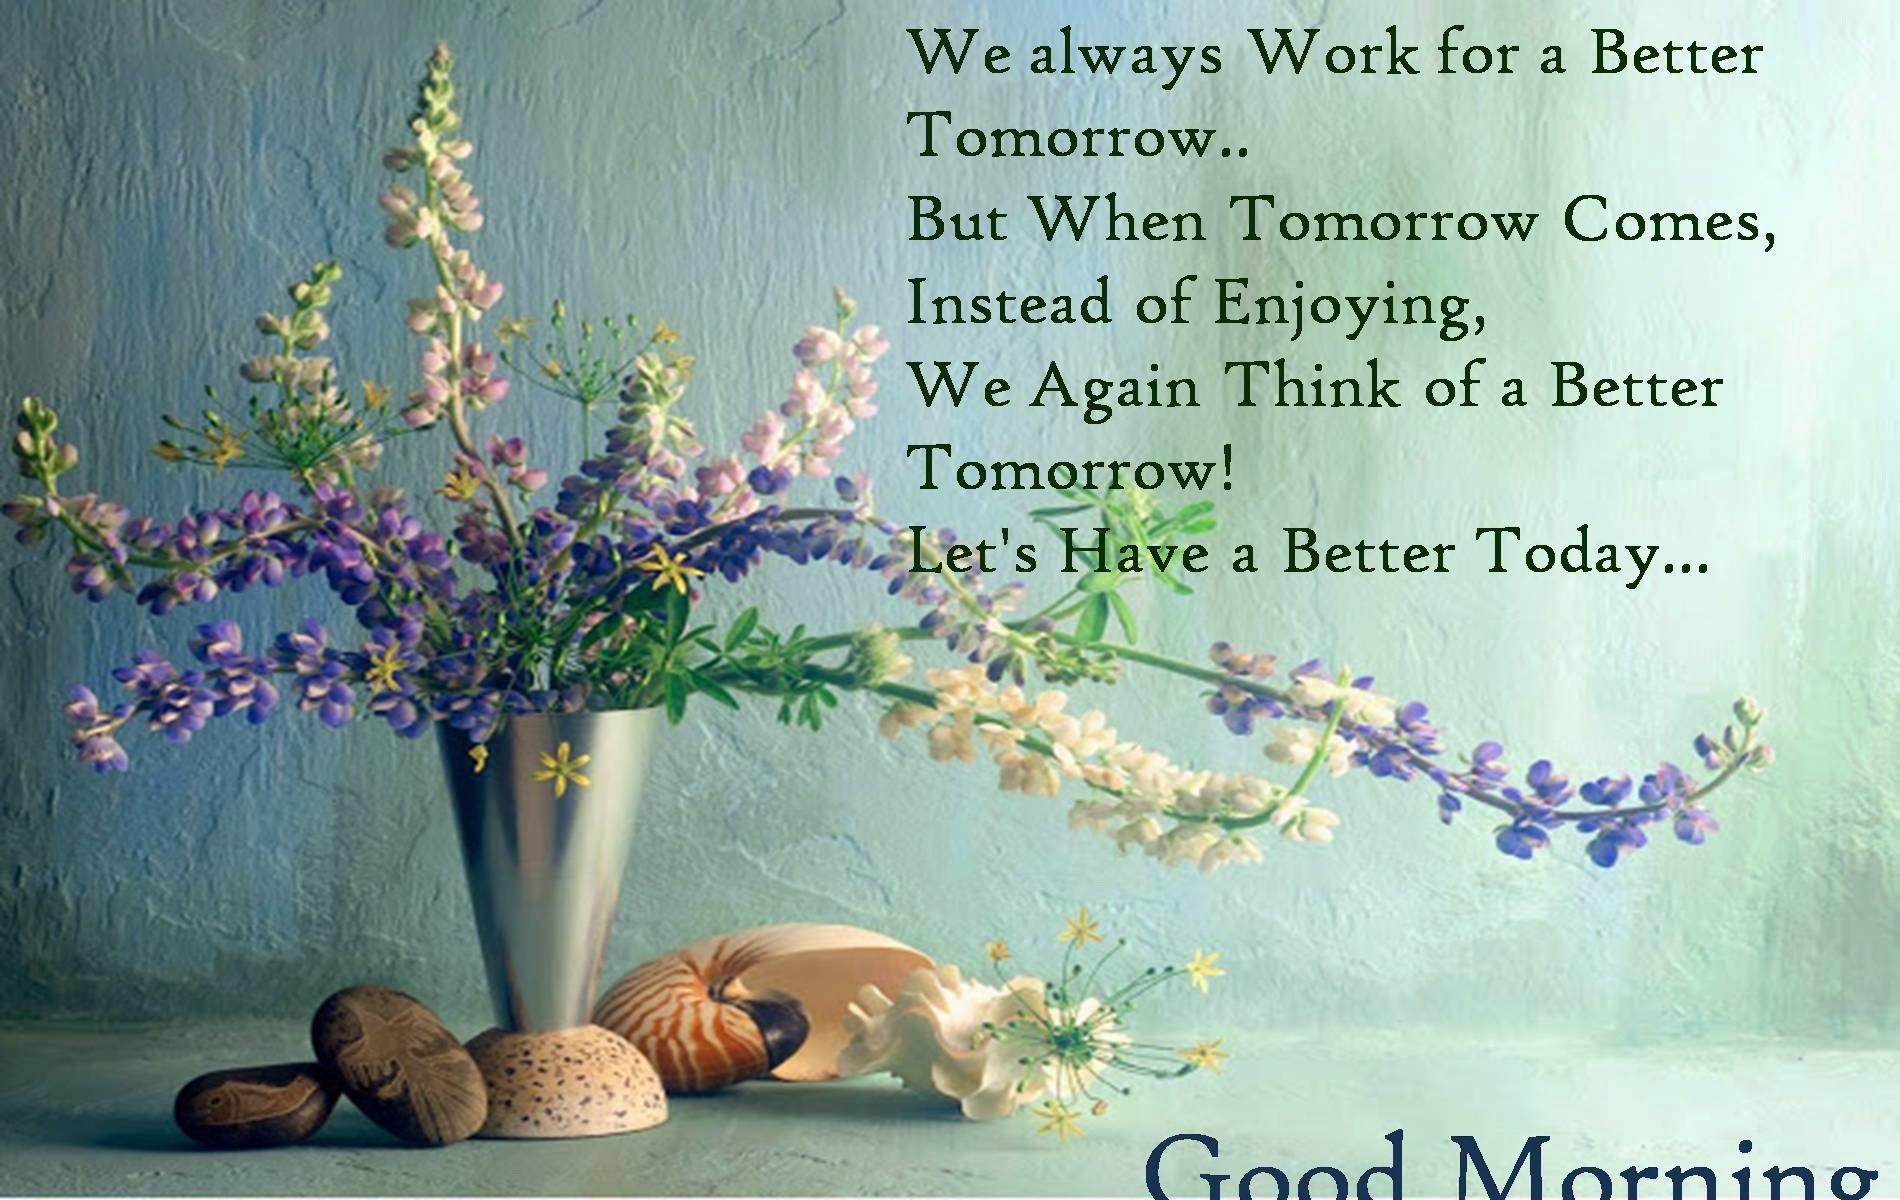 Good morning greetings motivational mood wallpaper 1900x1200 good morning greetings motivational mood wallpaper 1900x1200 426341 wallpaperup m4hsunfo